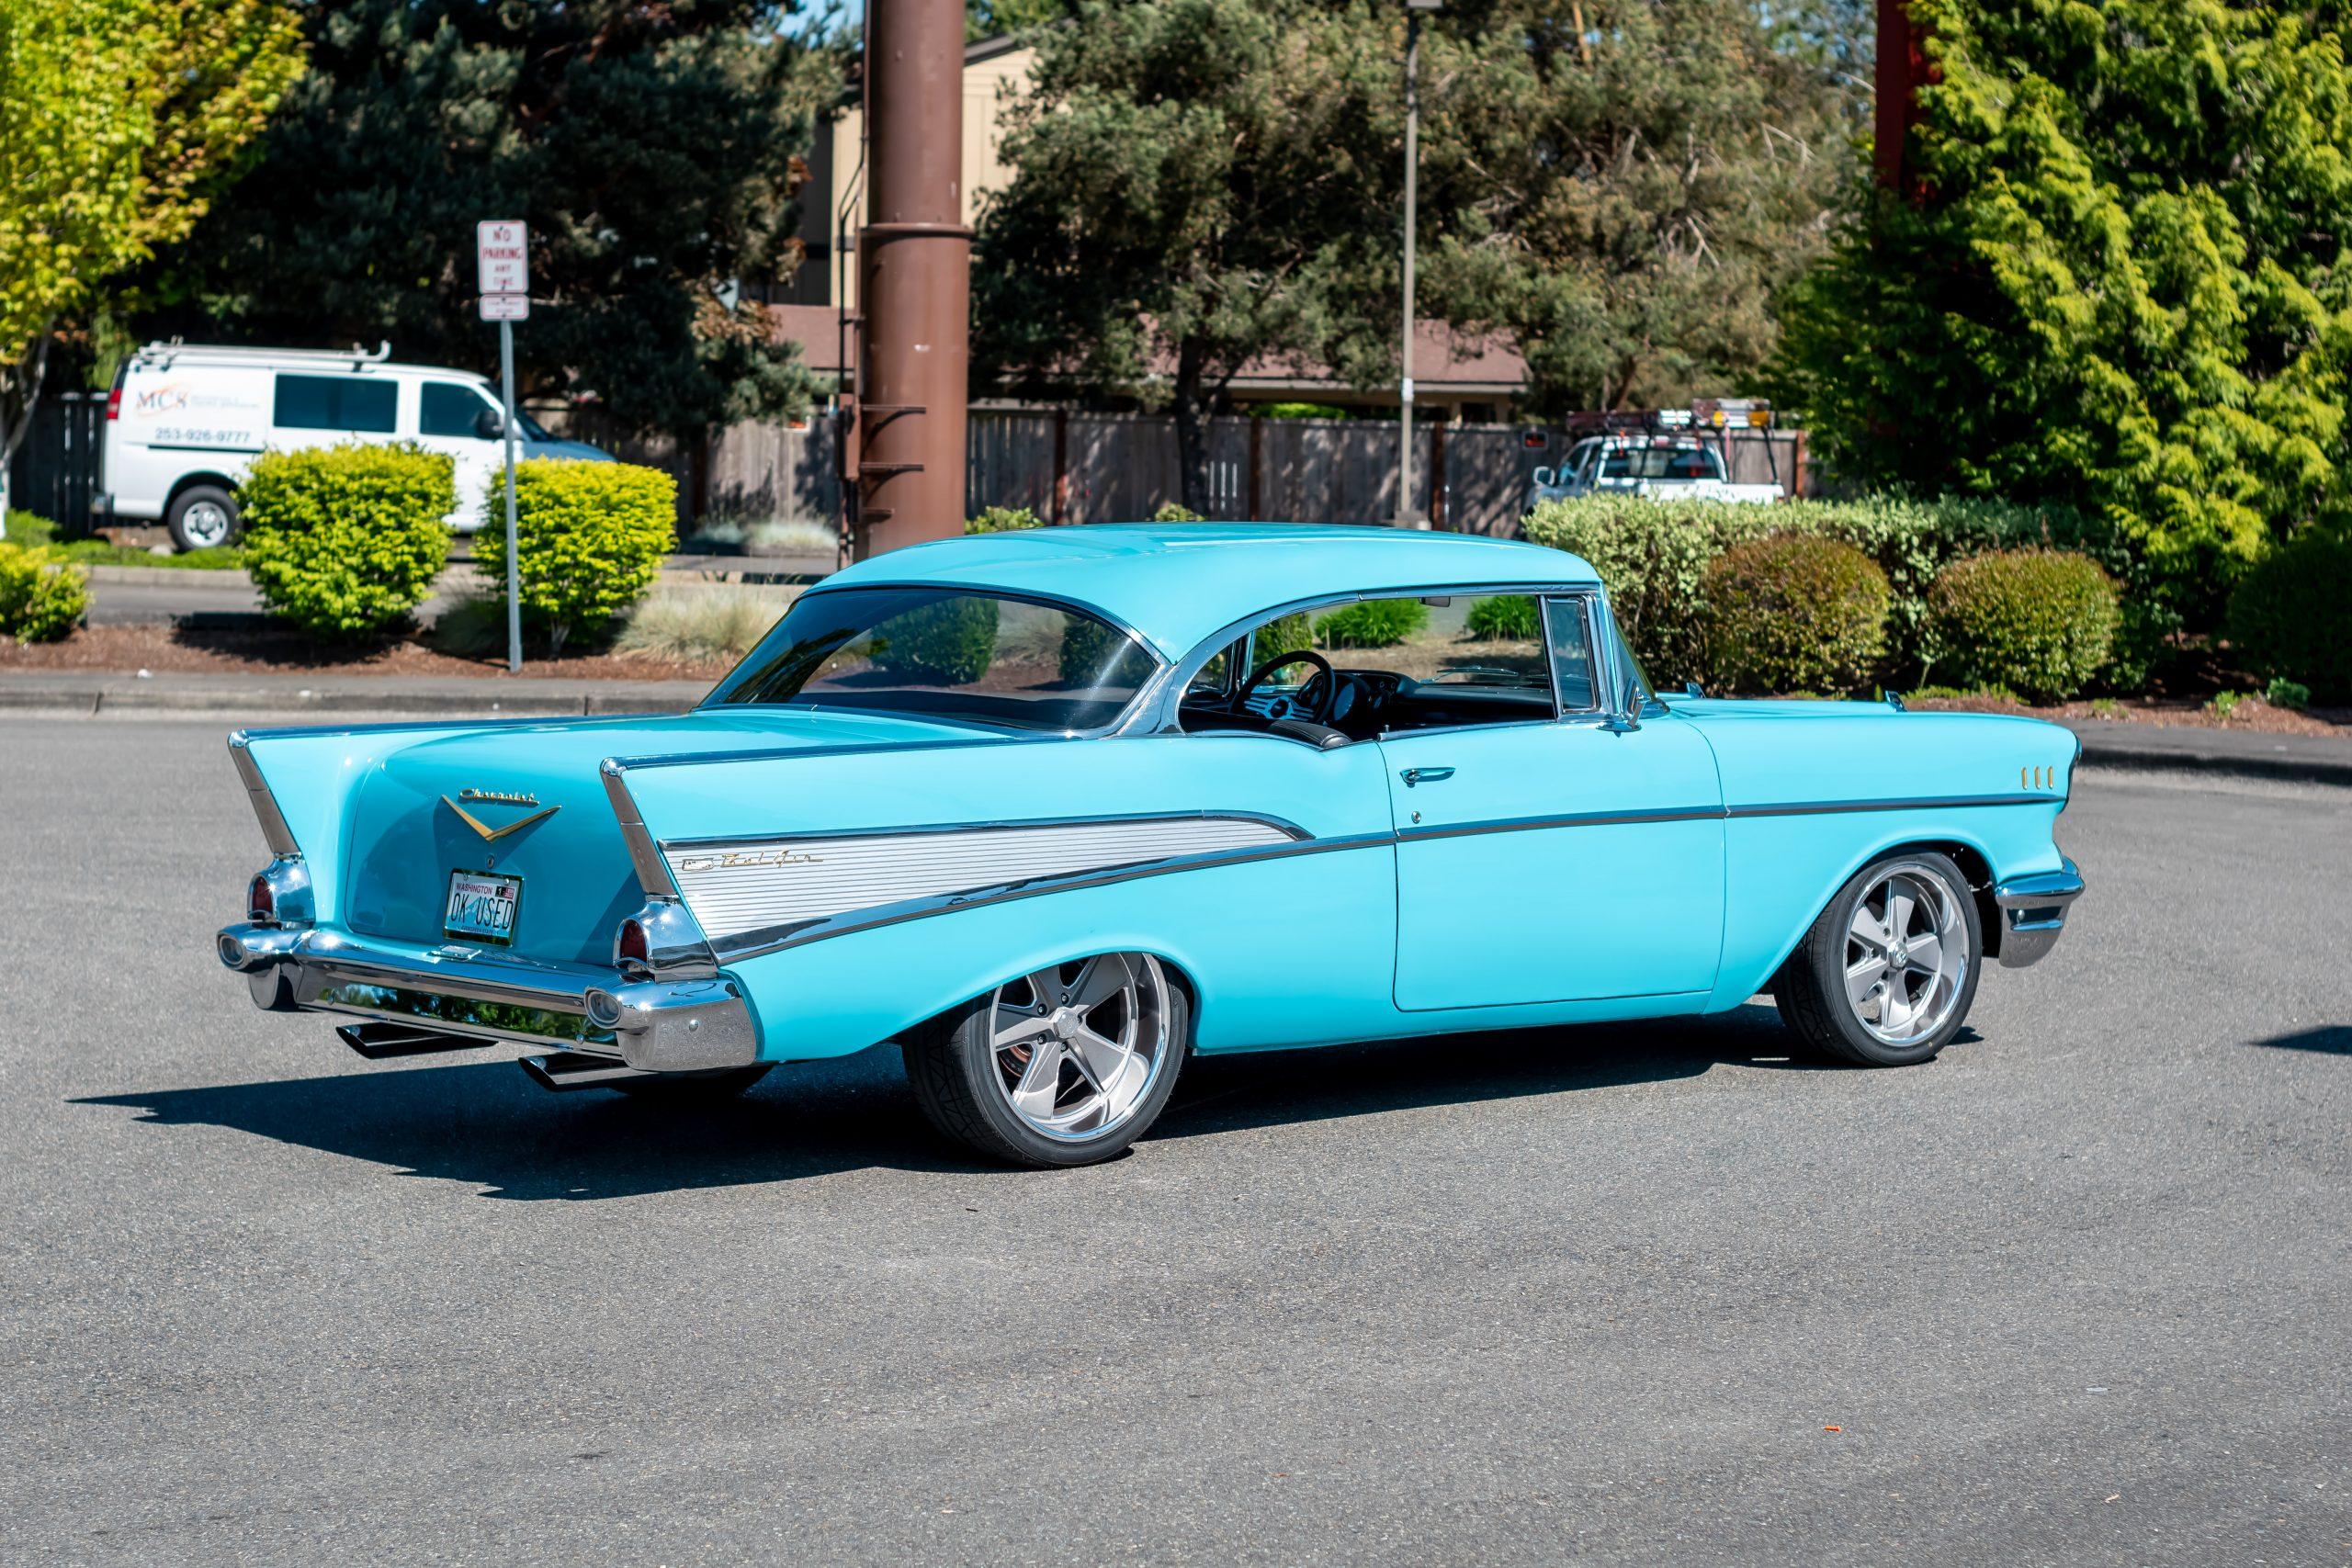 Chevrolet 1957 Preservation Is Key To Enjoying Vintage Vehicles